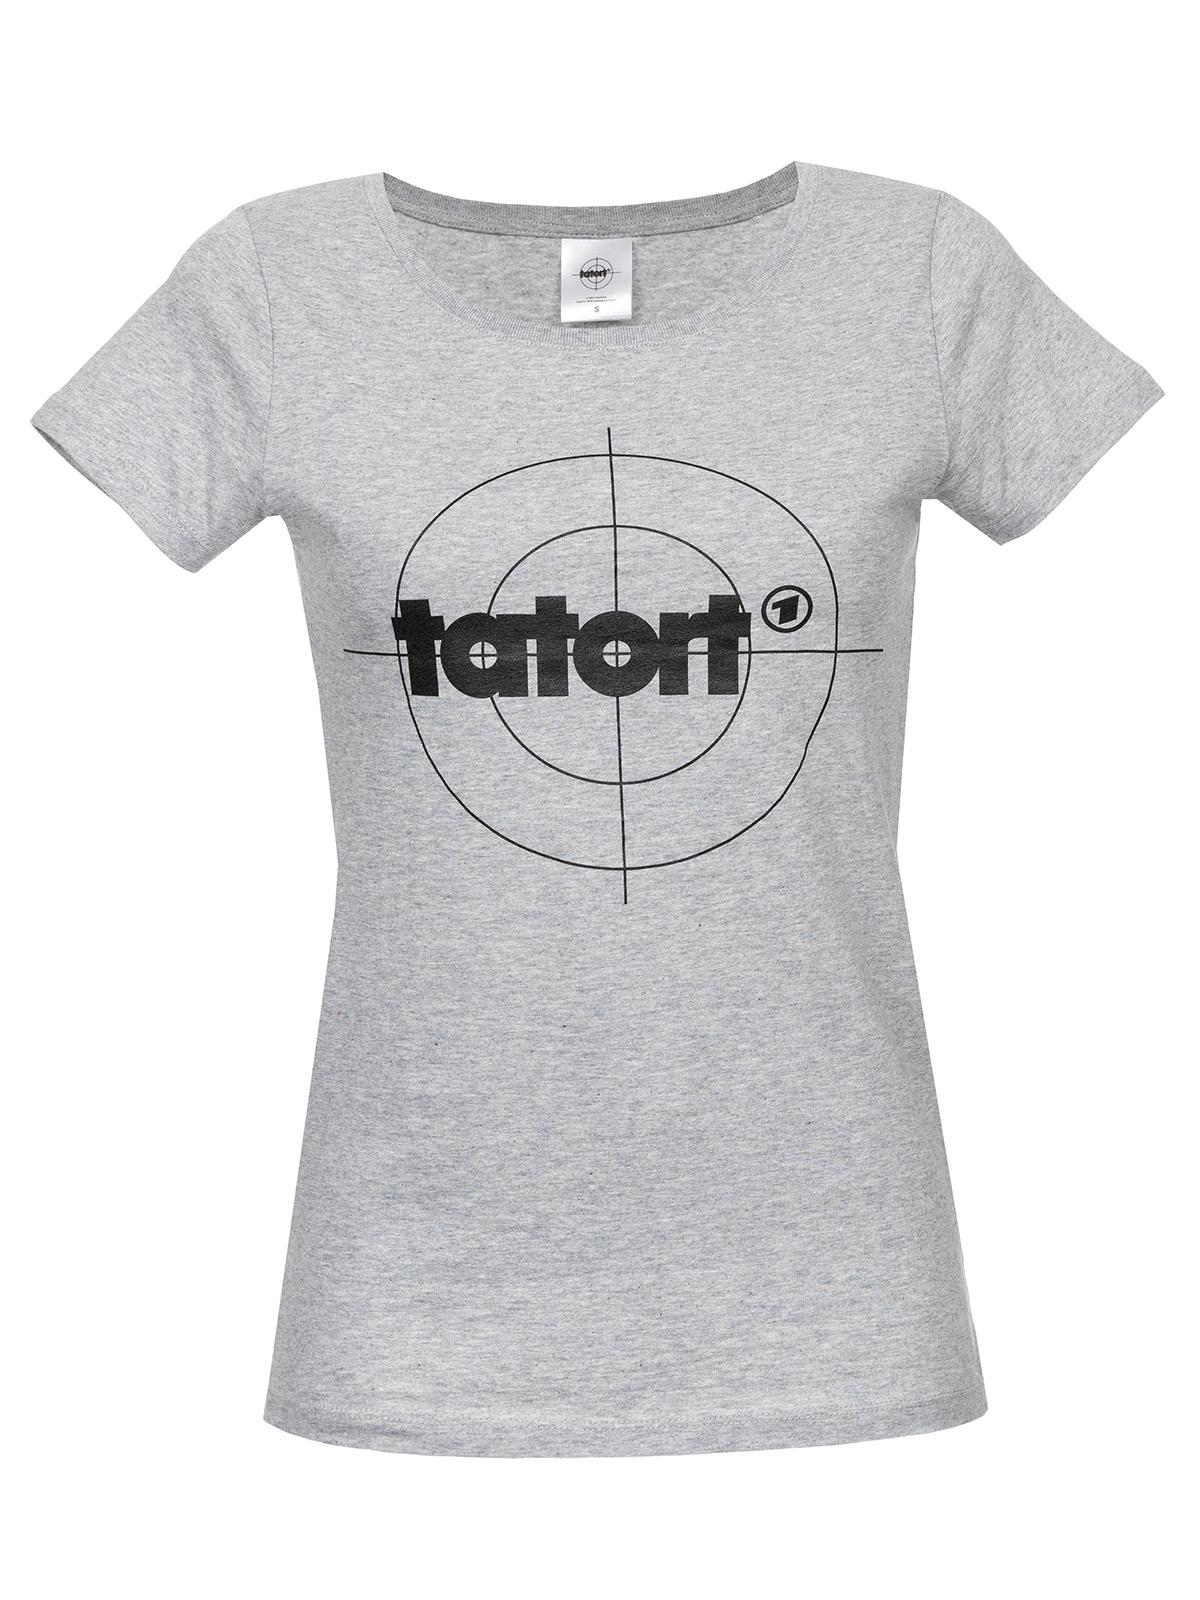 Oberteile - Tatort Classic Girl Shirt grau meliert – Größe XS  - Onlineshop NAPO Shop